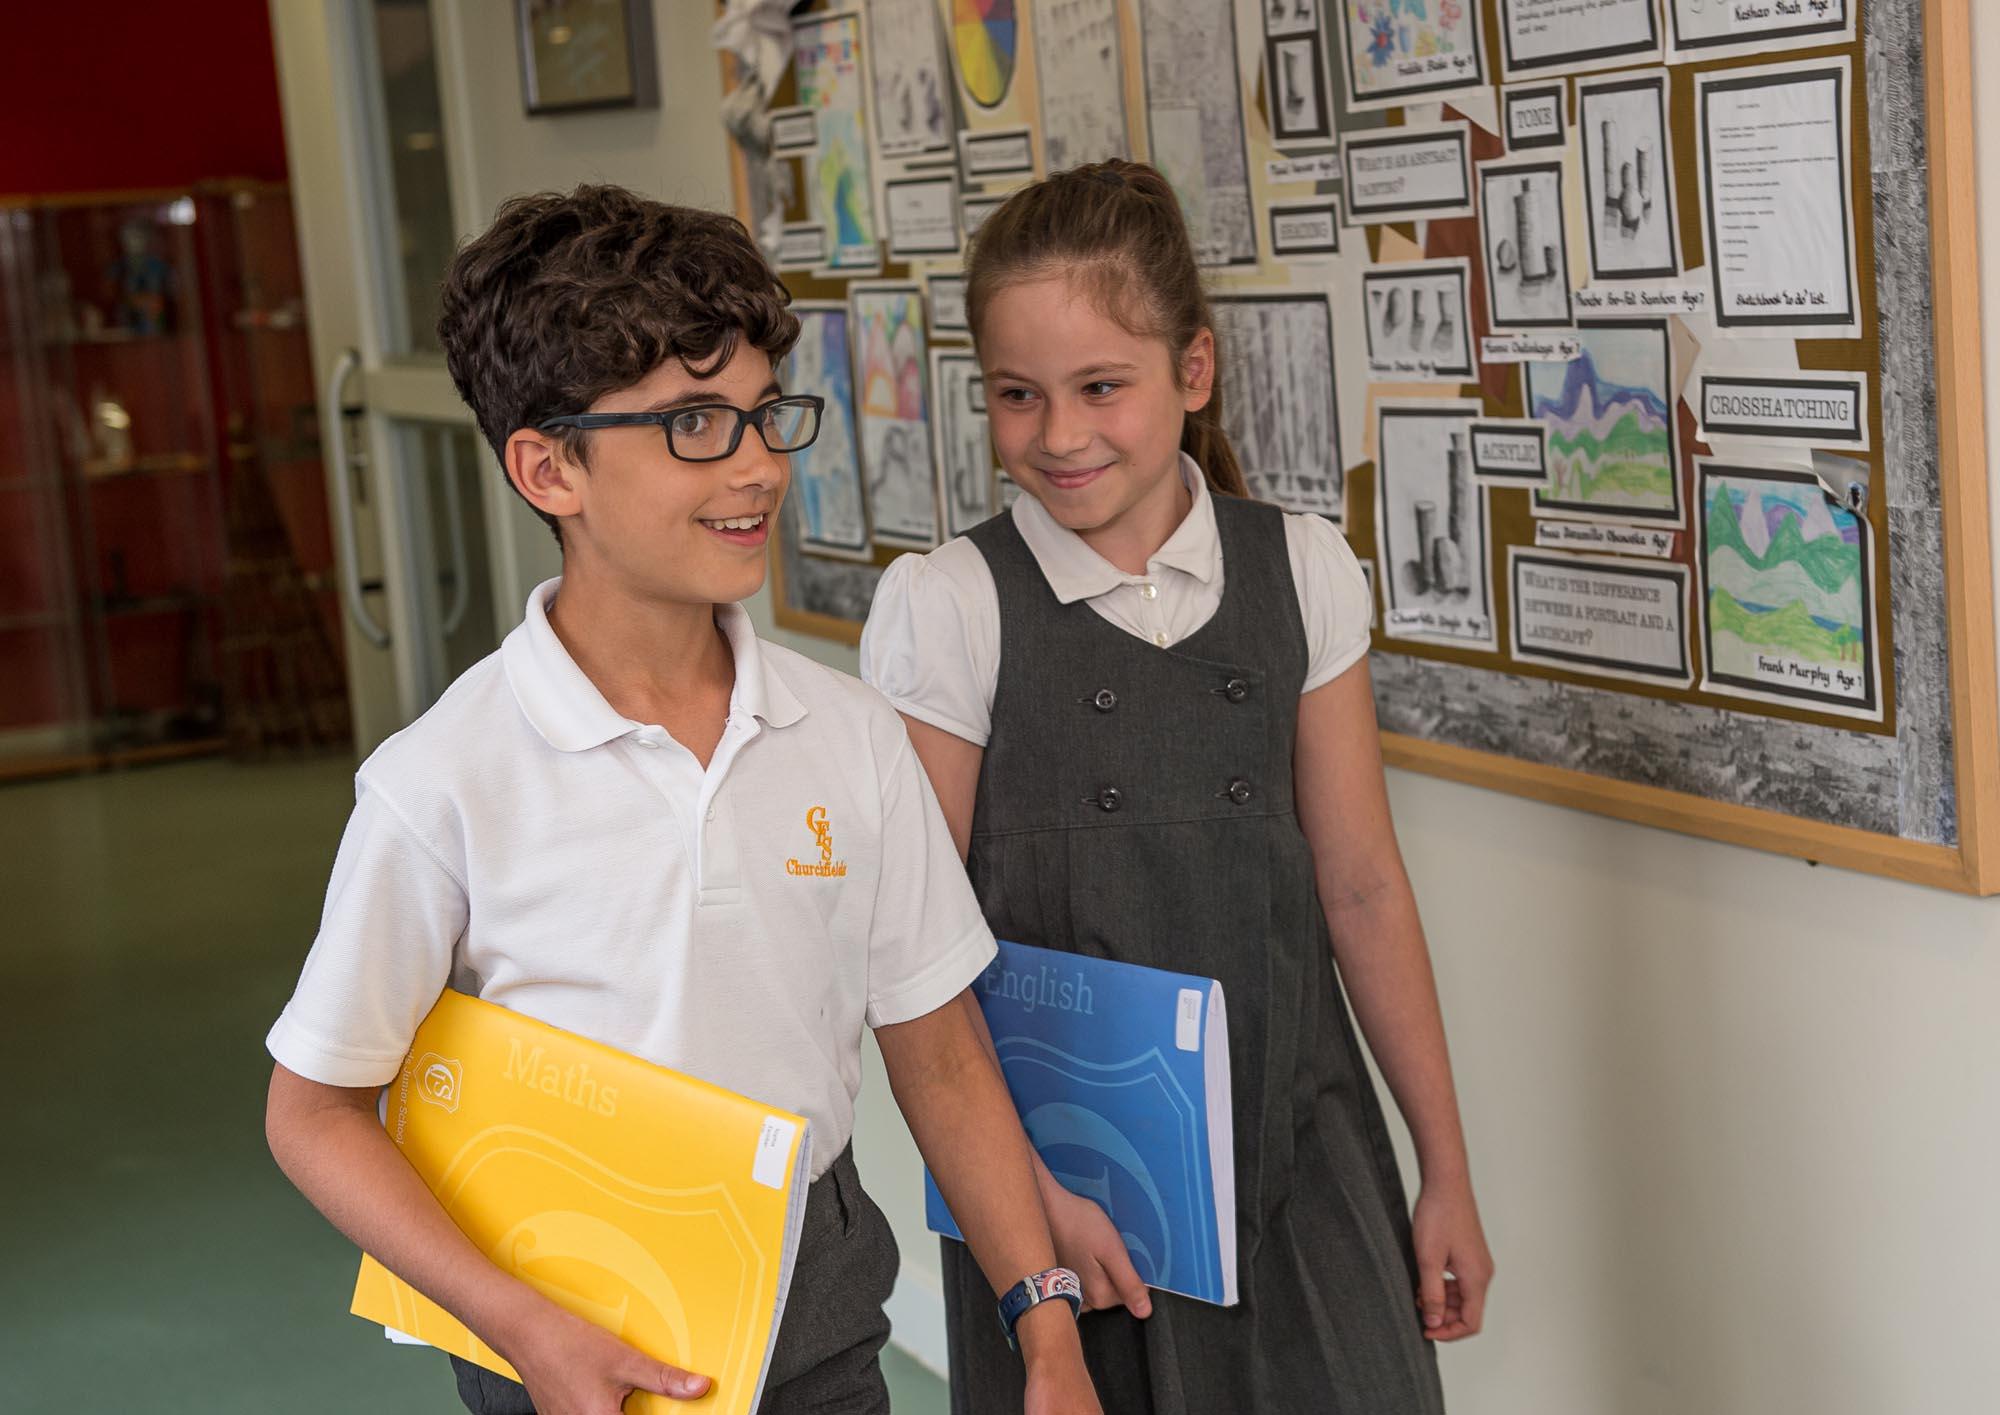 Boy and girl walking past display in corridor